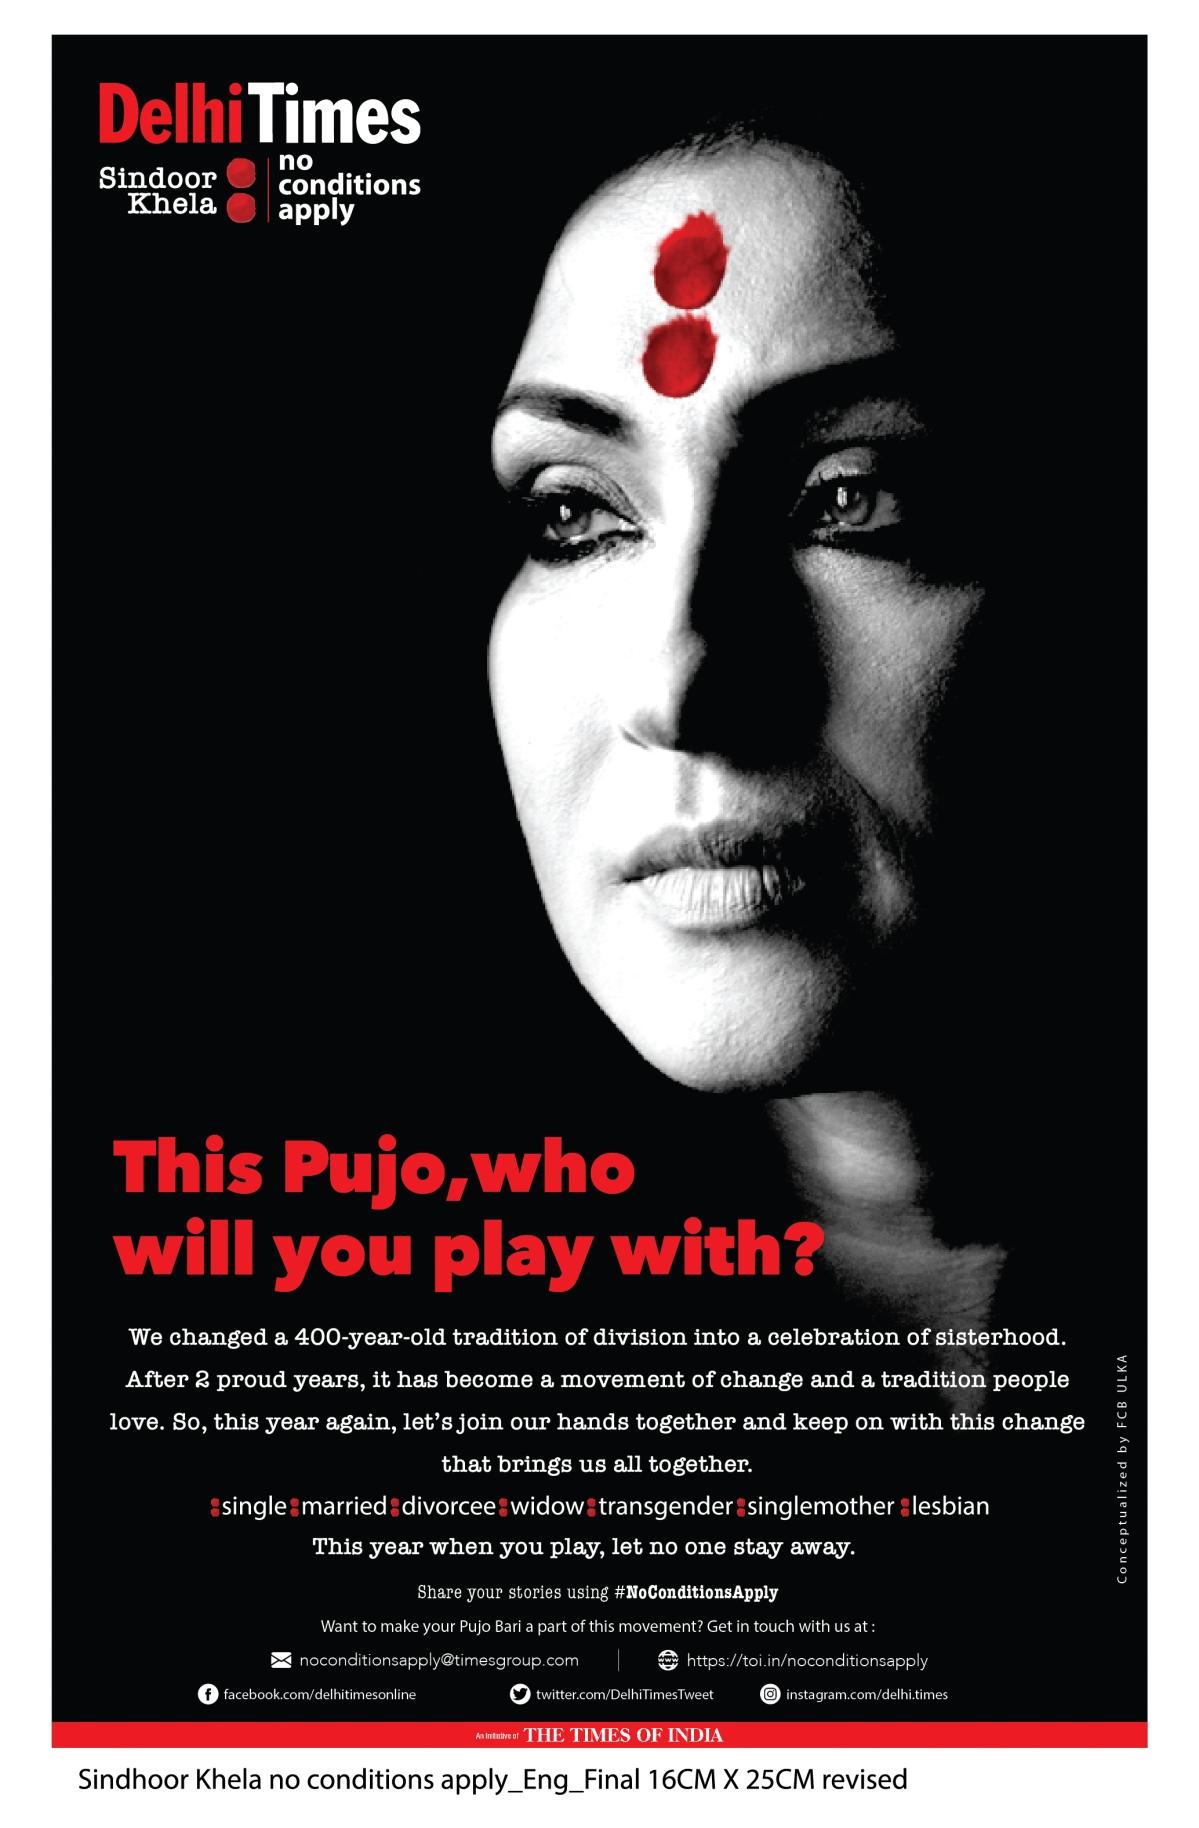 TOI brings back 3rd edition of its award-winning #NoConditionsApply – Sindoor Khela campaign